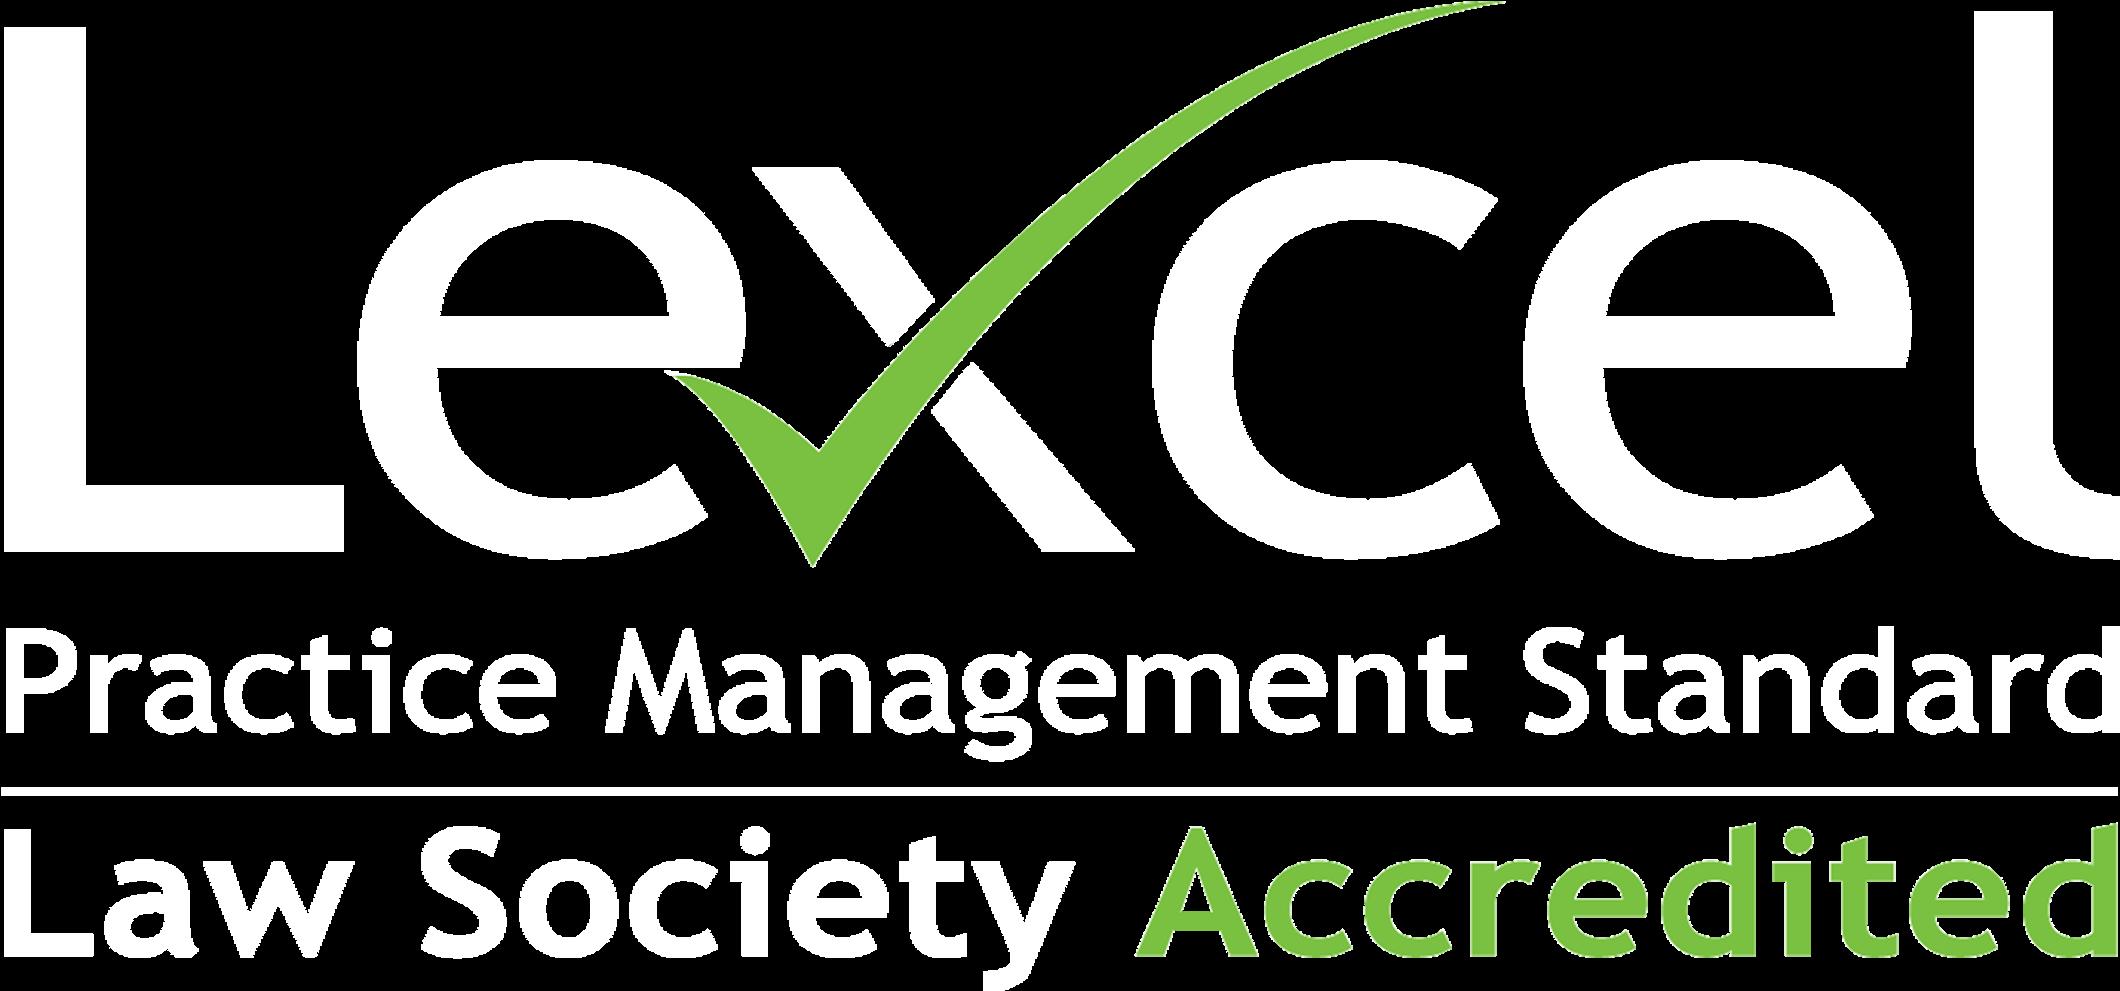 https://ghwsolicitors.co.uk/wp-content/uploads/2021/01/Lexcel-1.png